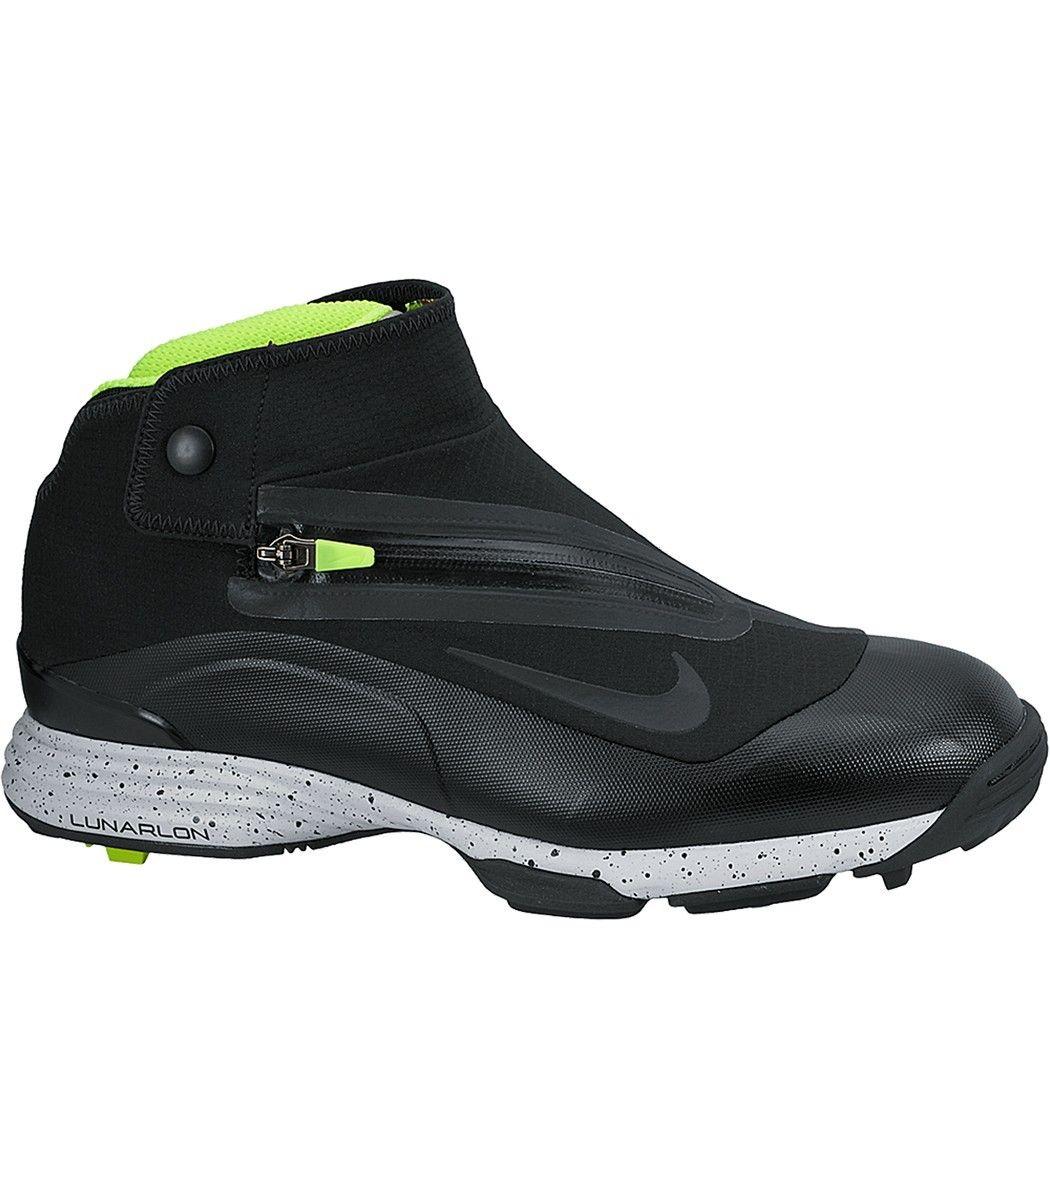 the best attitude 2306e 1a03e ... Nike Lunar Bandon II Golf Shoes - Golf Shoes - Puetz Golf ...